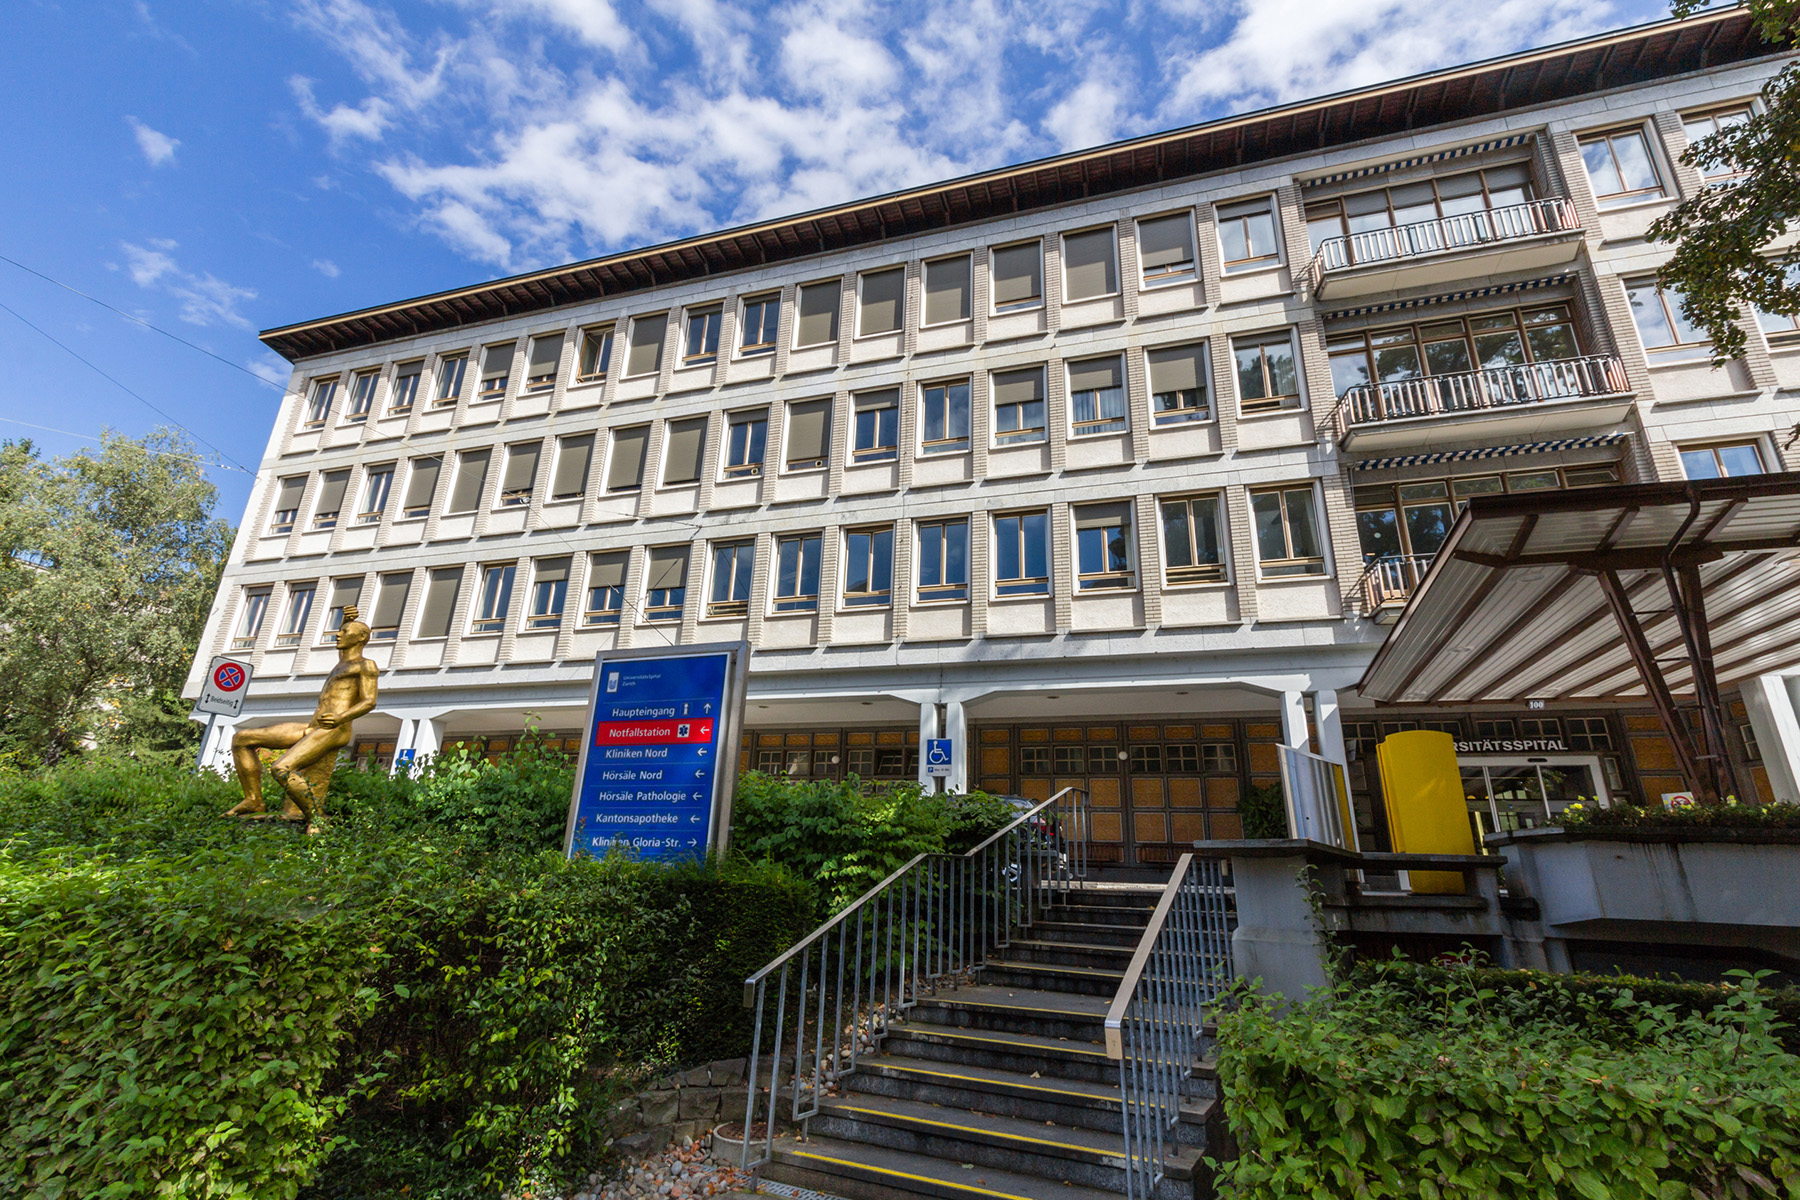 The University Hospital of Zurich